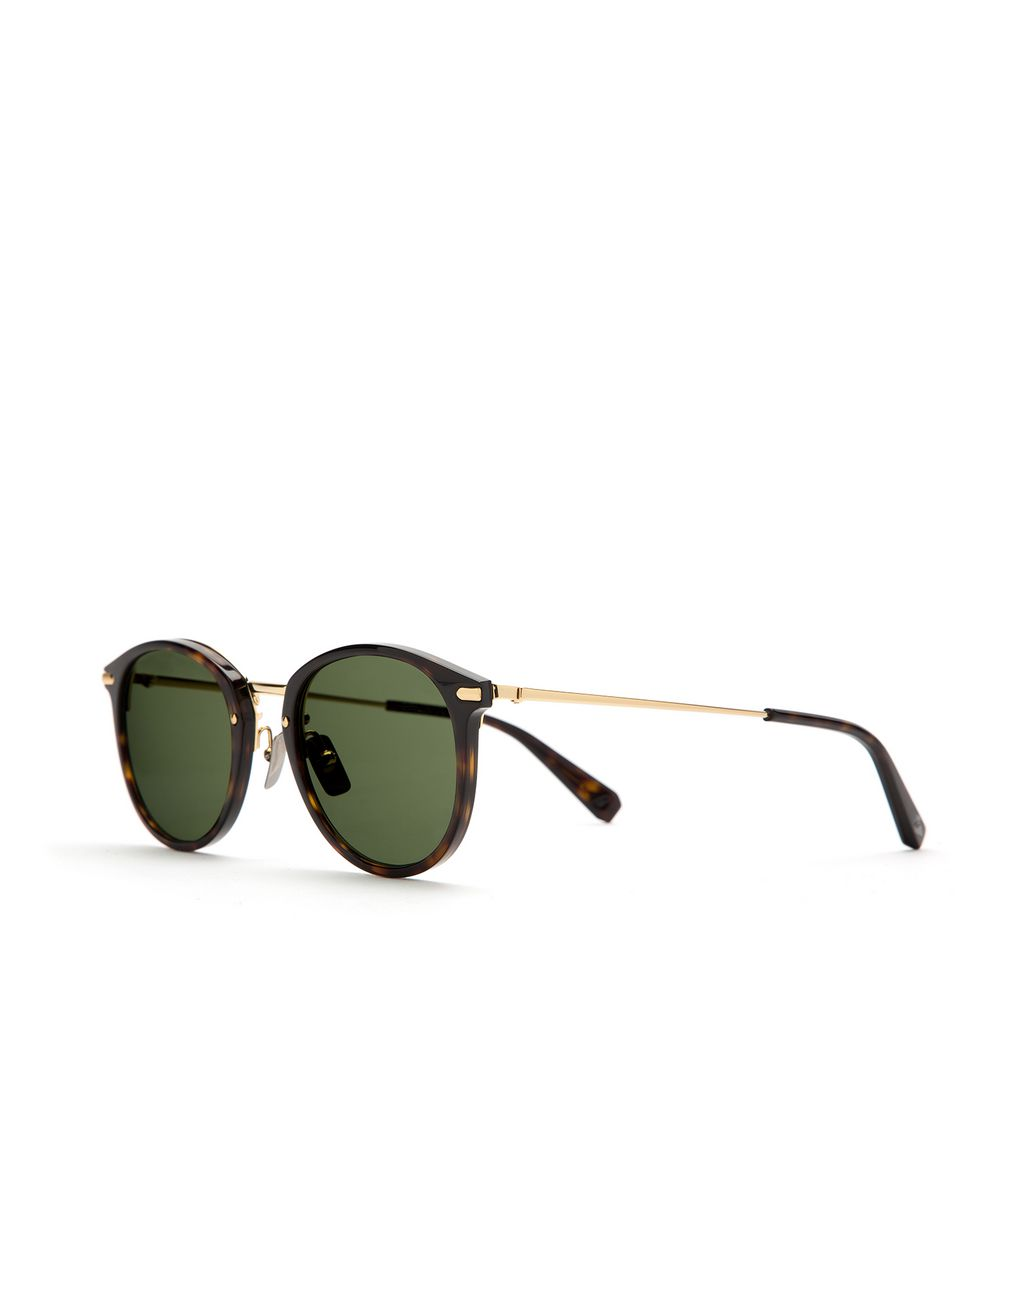 "BRIONI Солнцезащитные очки в блестящей оправе цвета ""гавана"" с зелеными линзами Солнцезащитные очки Для Мужчин r"